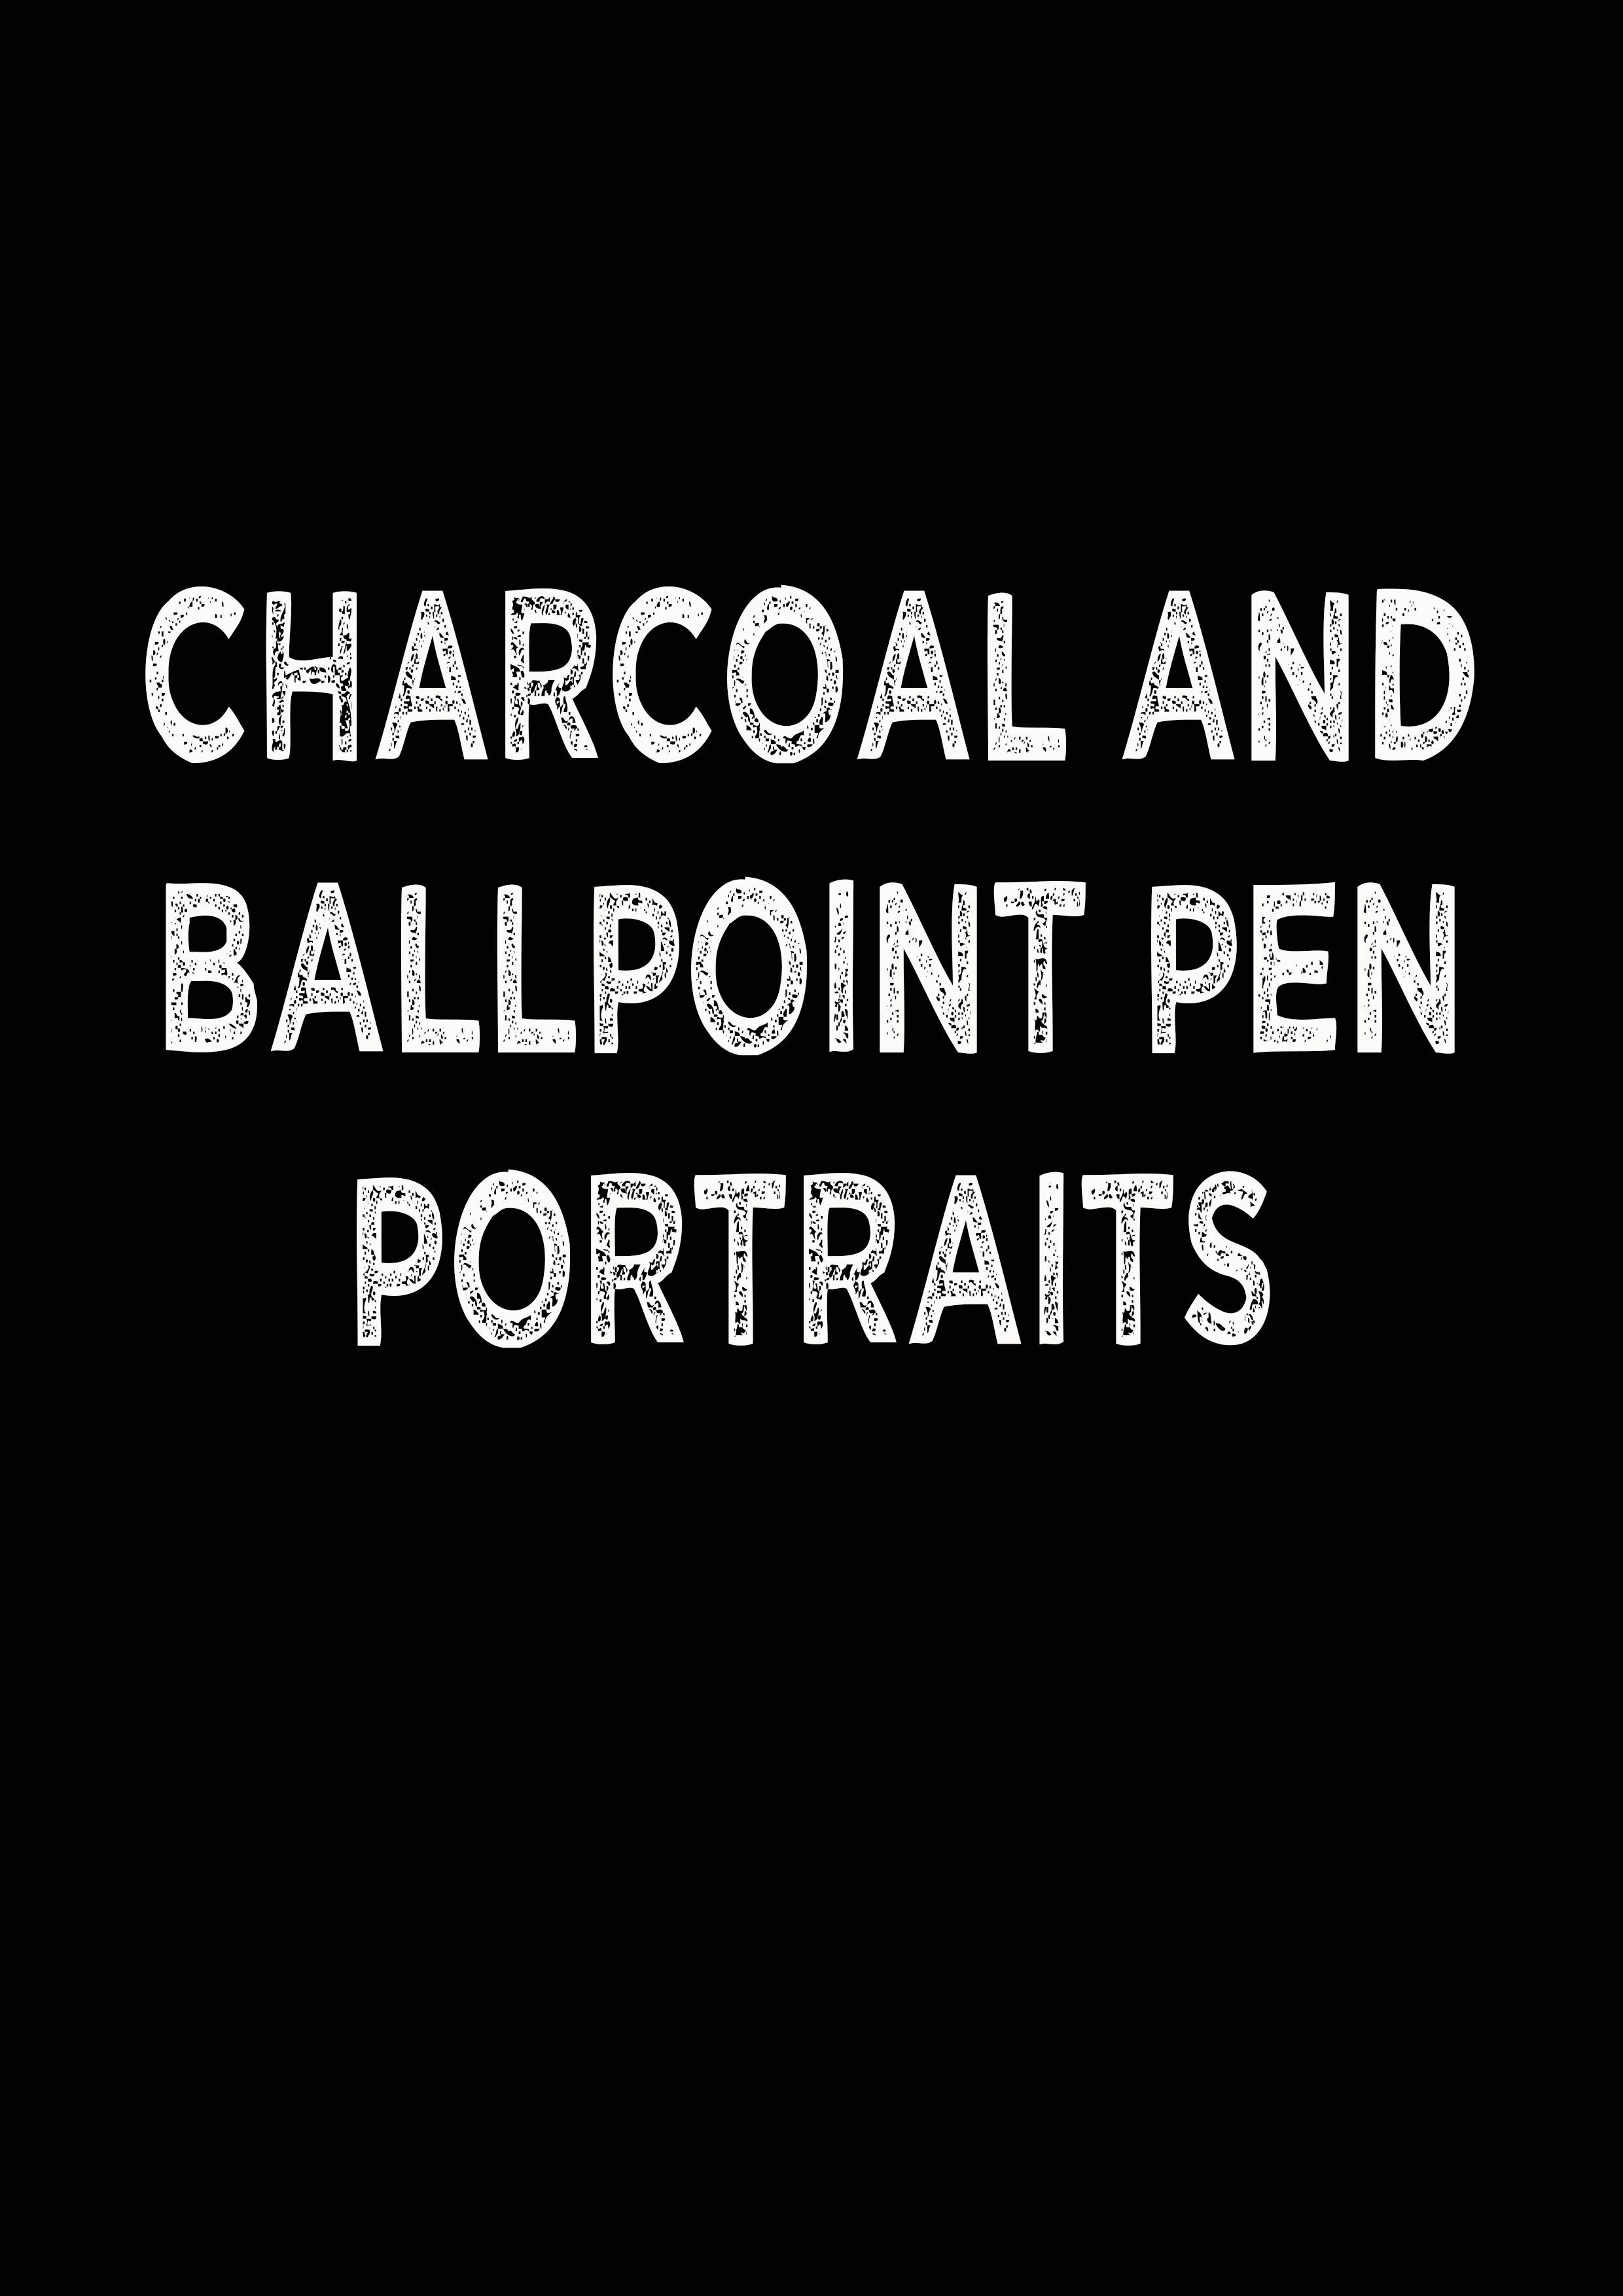 CHARCOAL LABEL.jpg